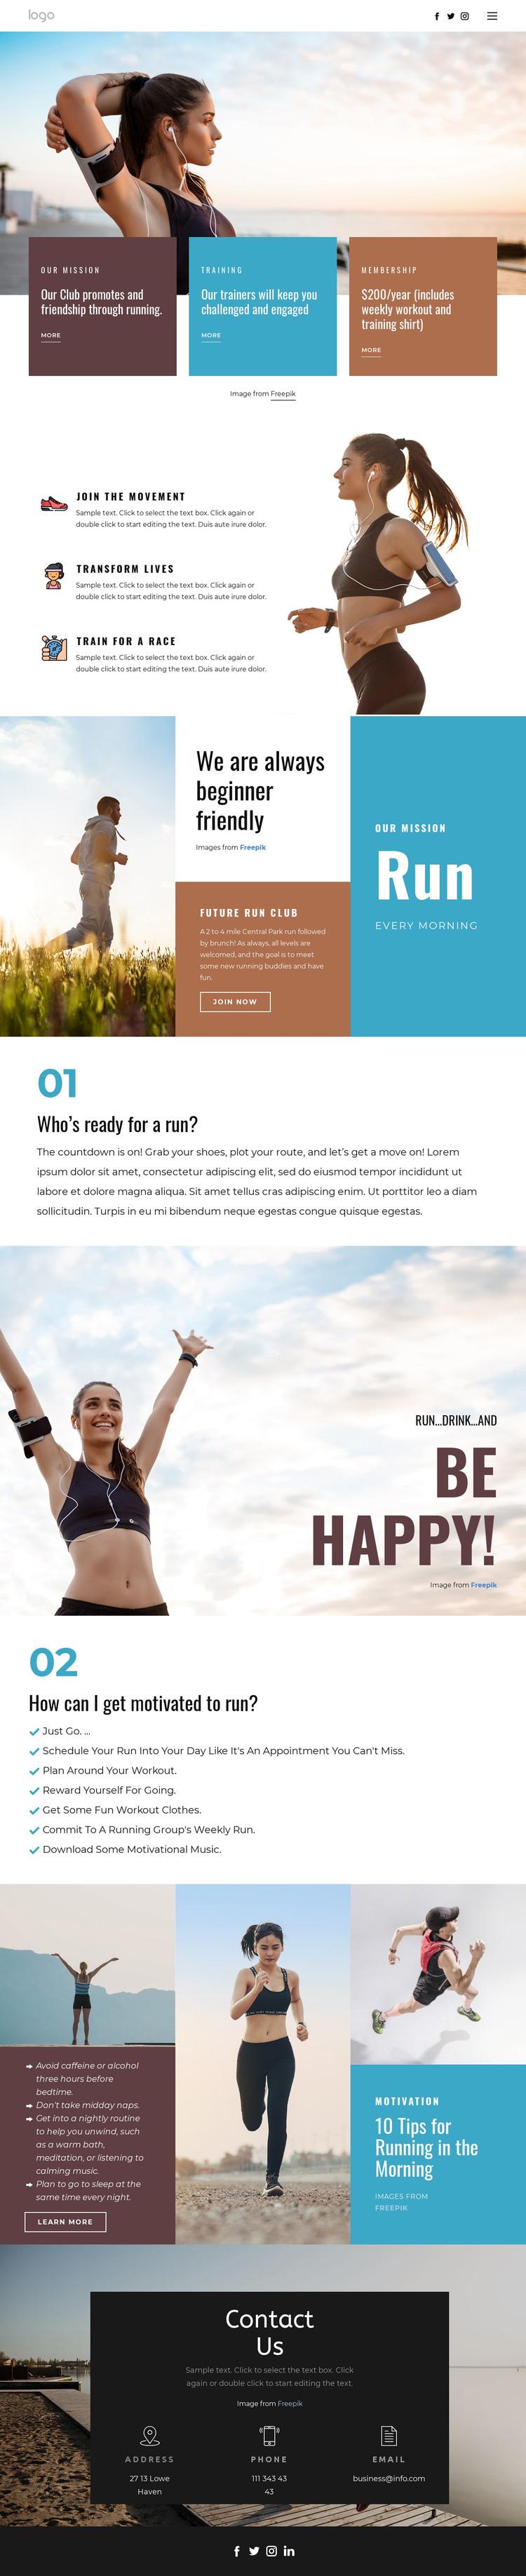 Running club for sports Web Design